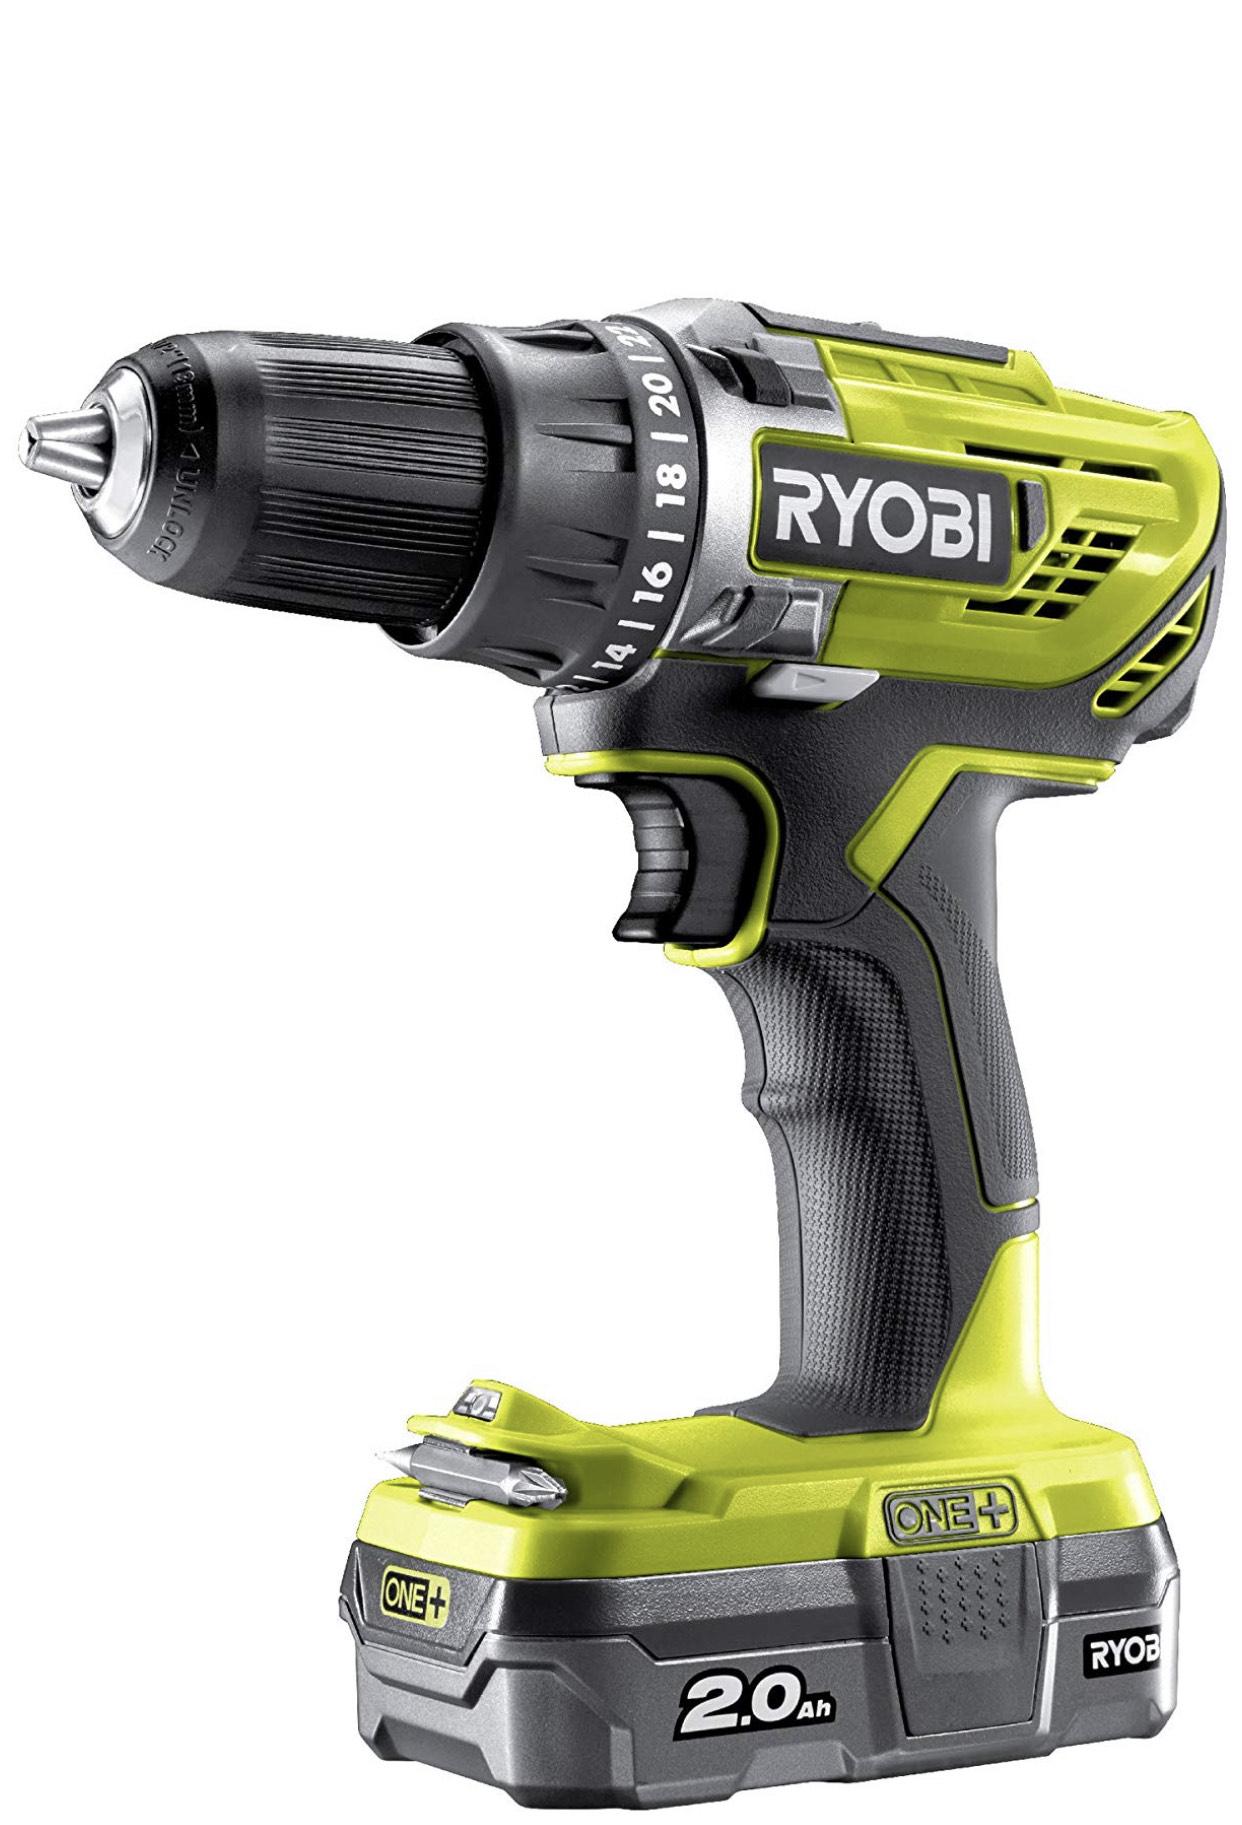 Ryobi R18DD3-120S One Plus Cordless Drill Driver Starter Kit £83.99 @ amazon